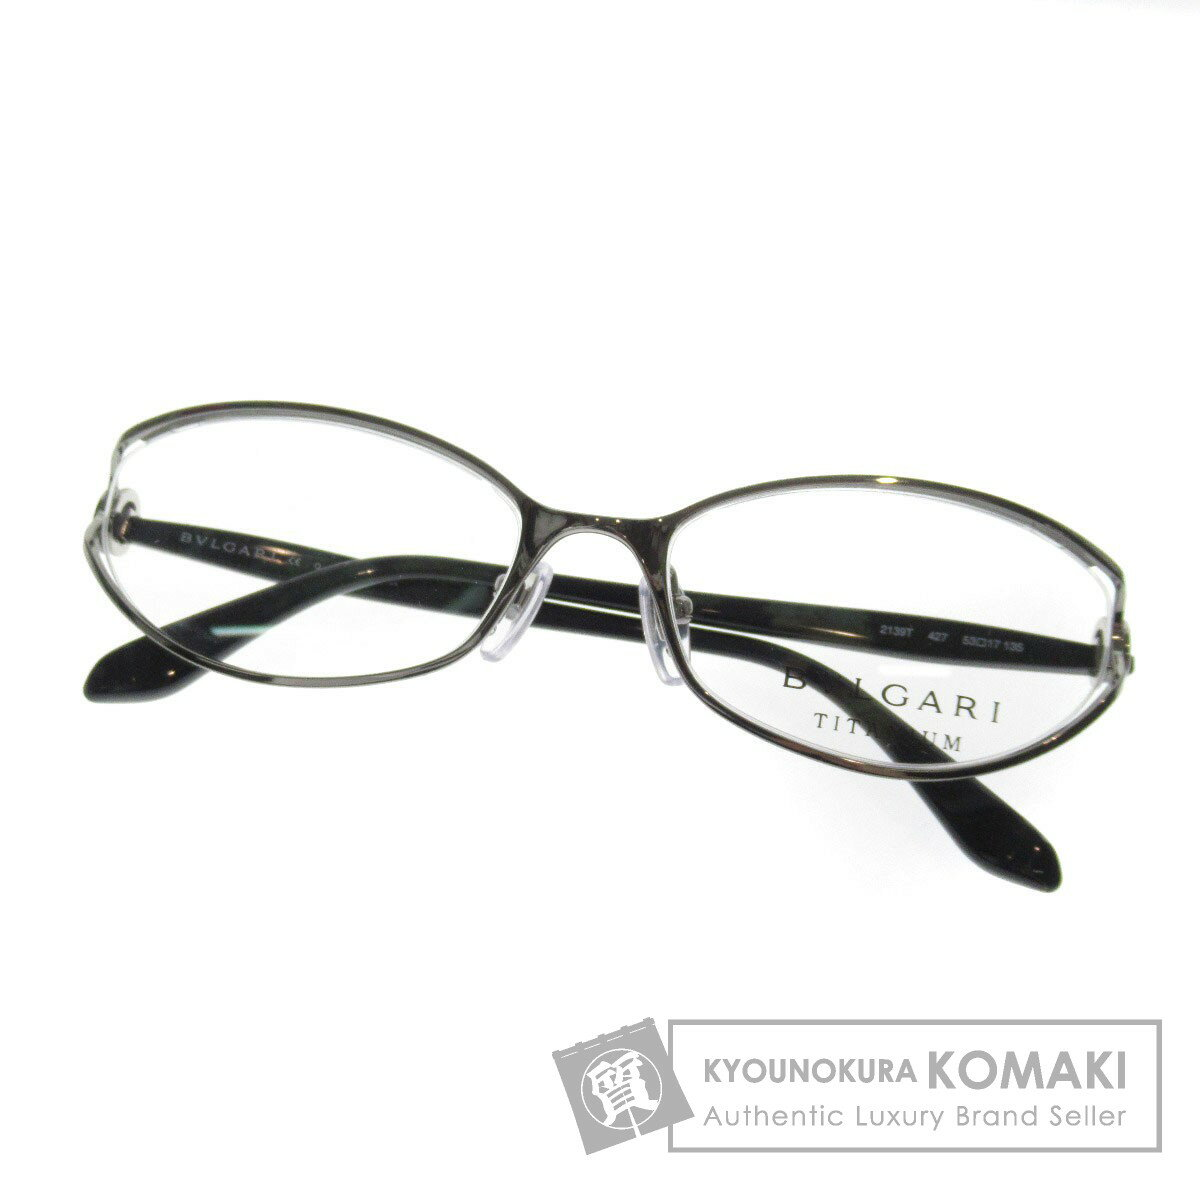 BVLGARI ロゴモチーフ 眼鏡 プラスチック レディース 【中古】【ブルガリ】